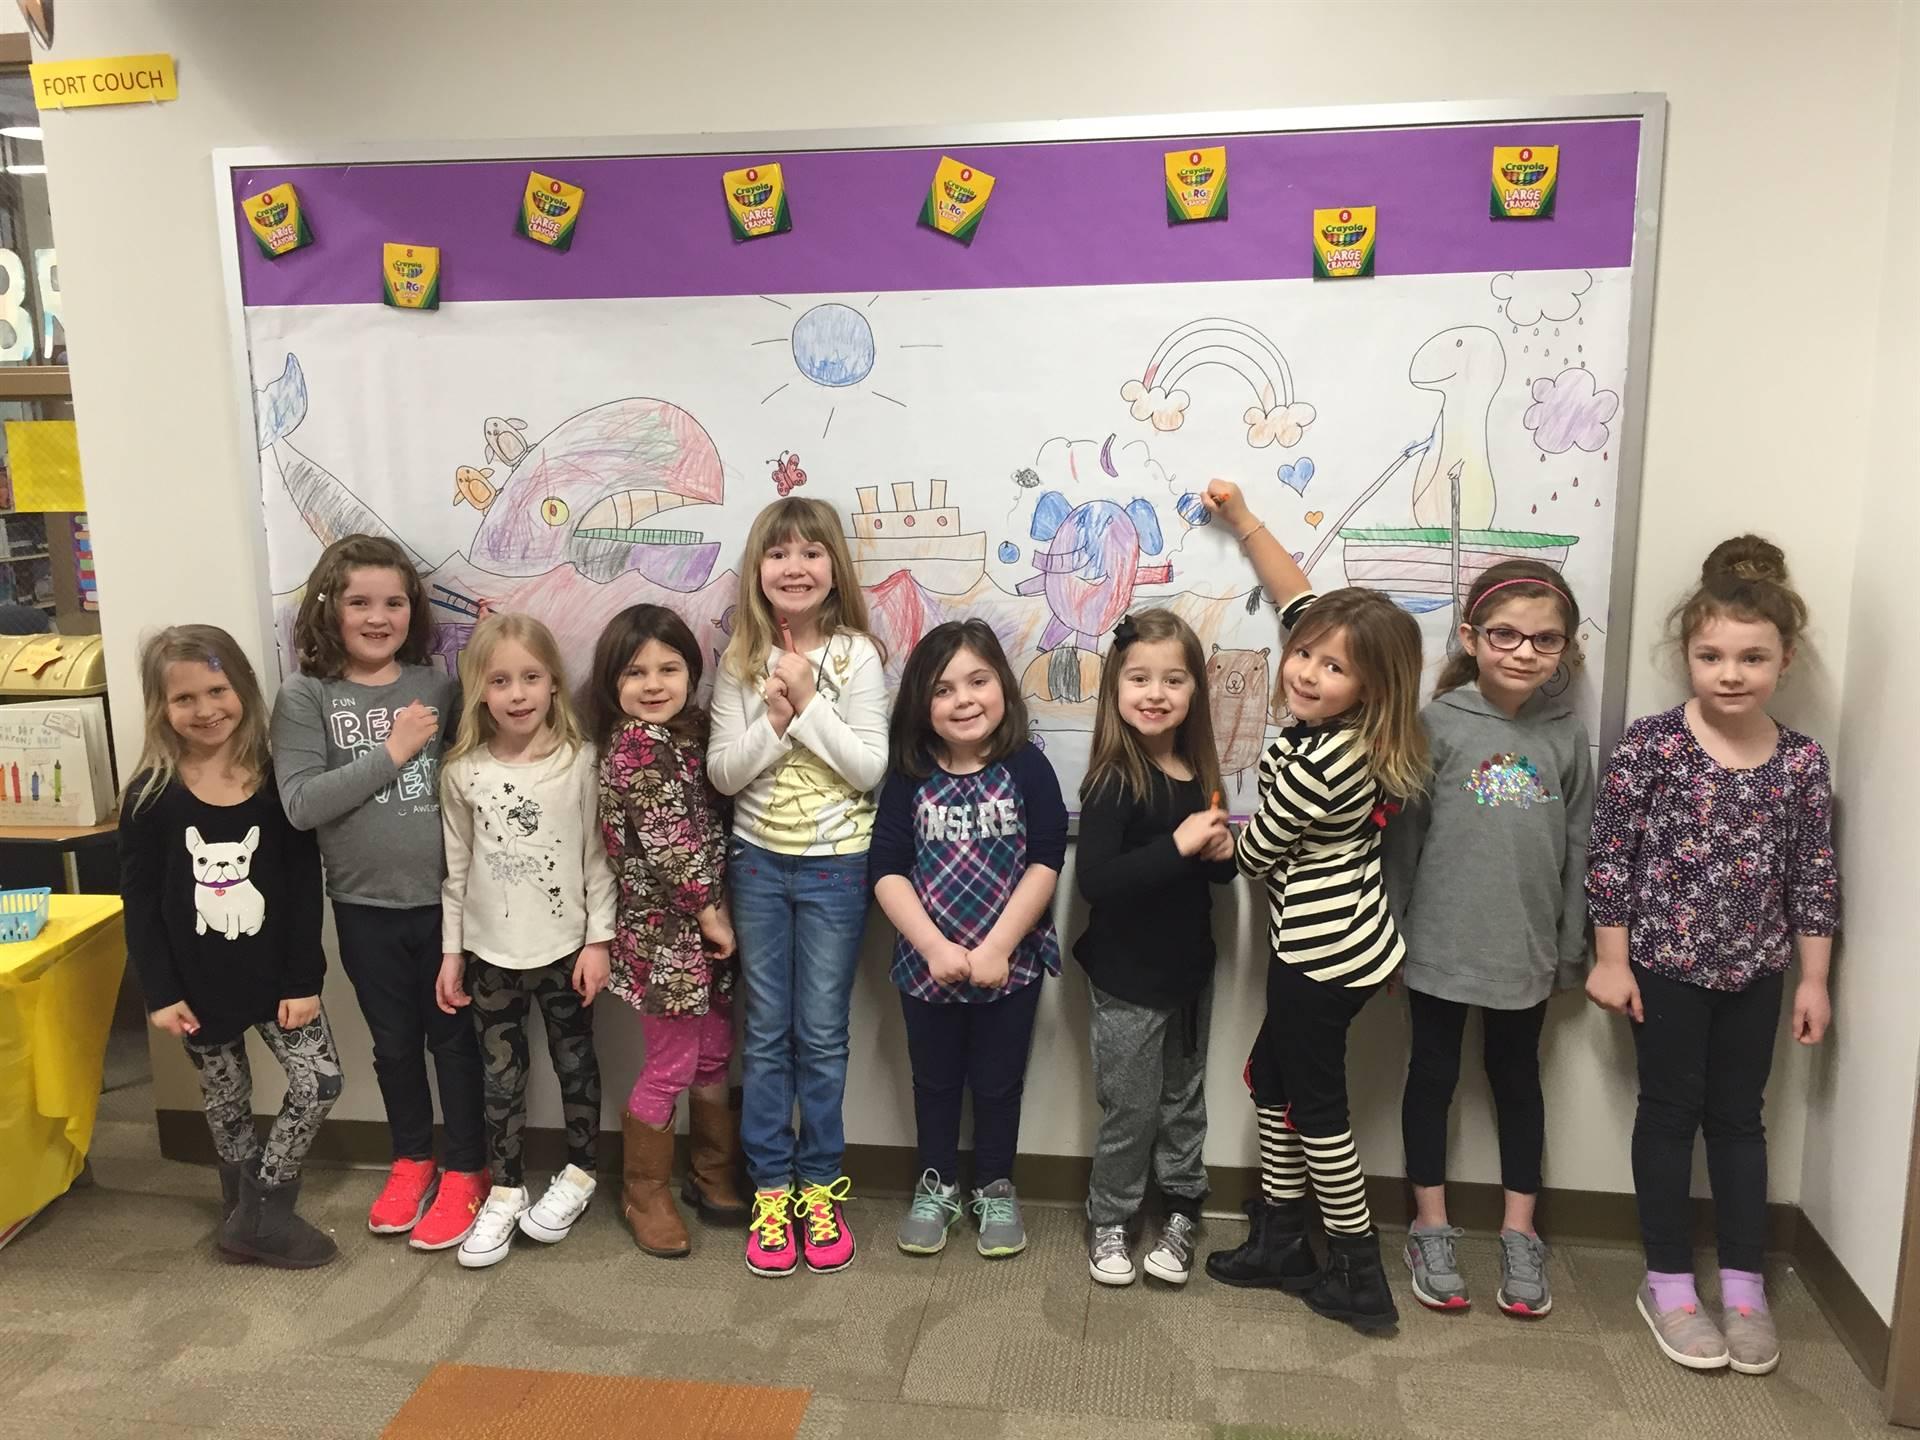 Kindergarten students coloring a bulletin board in the school lobby